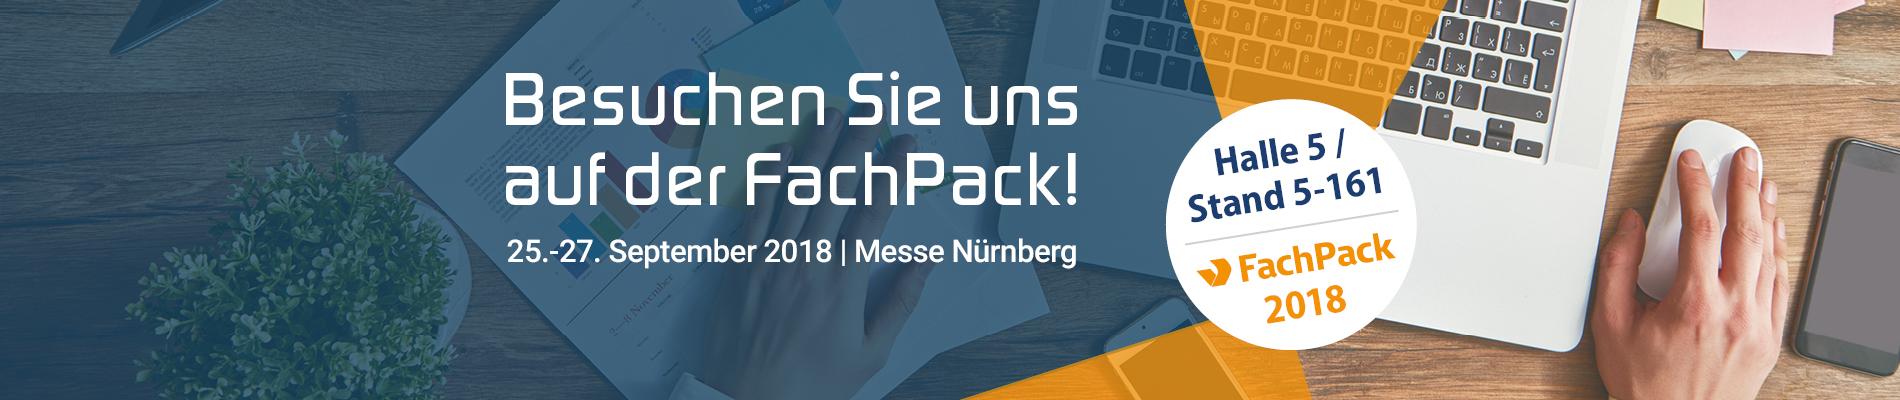 FachPack 2018 Desktop